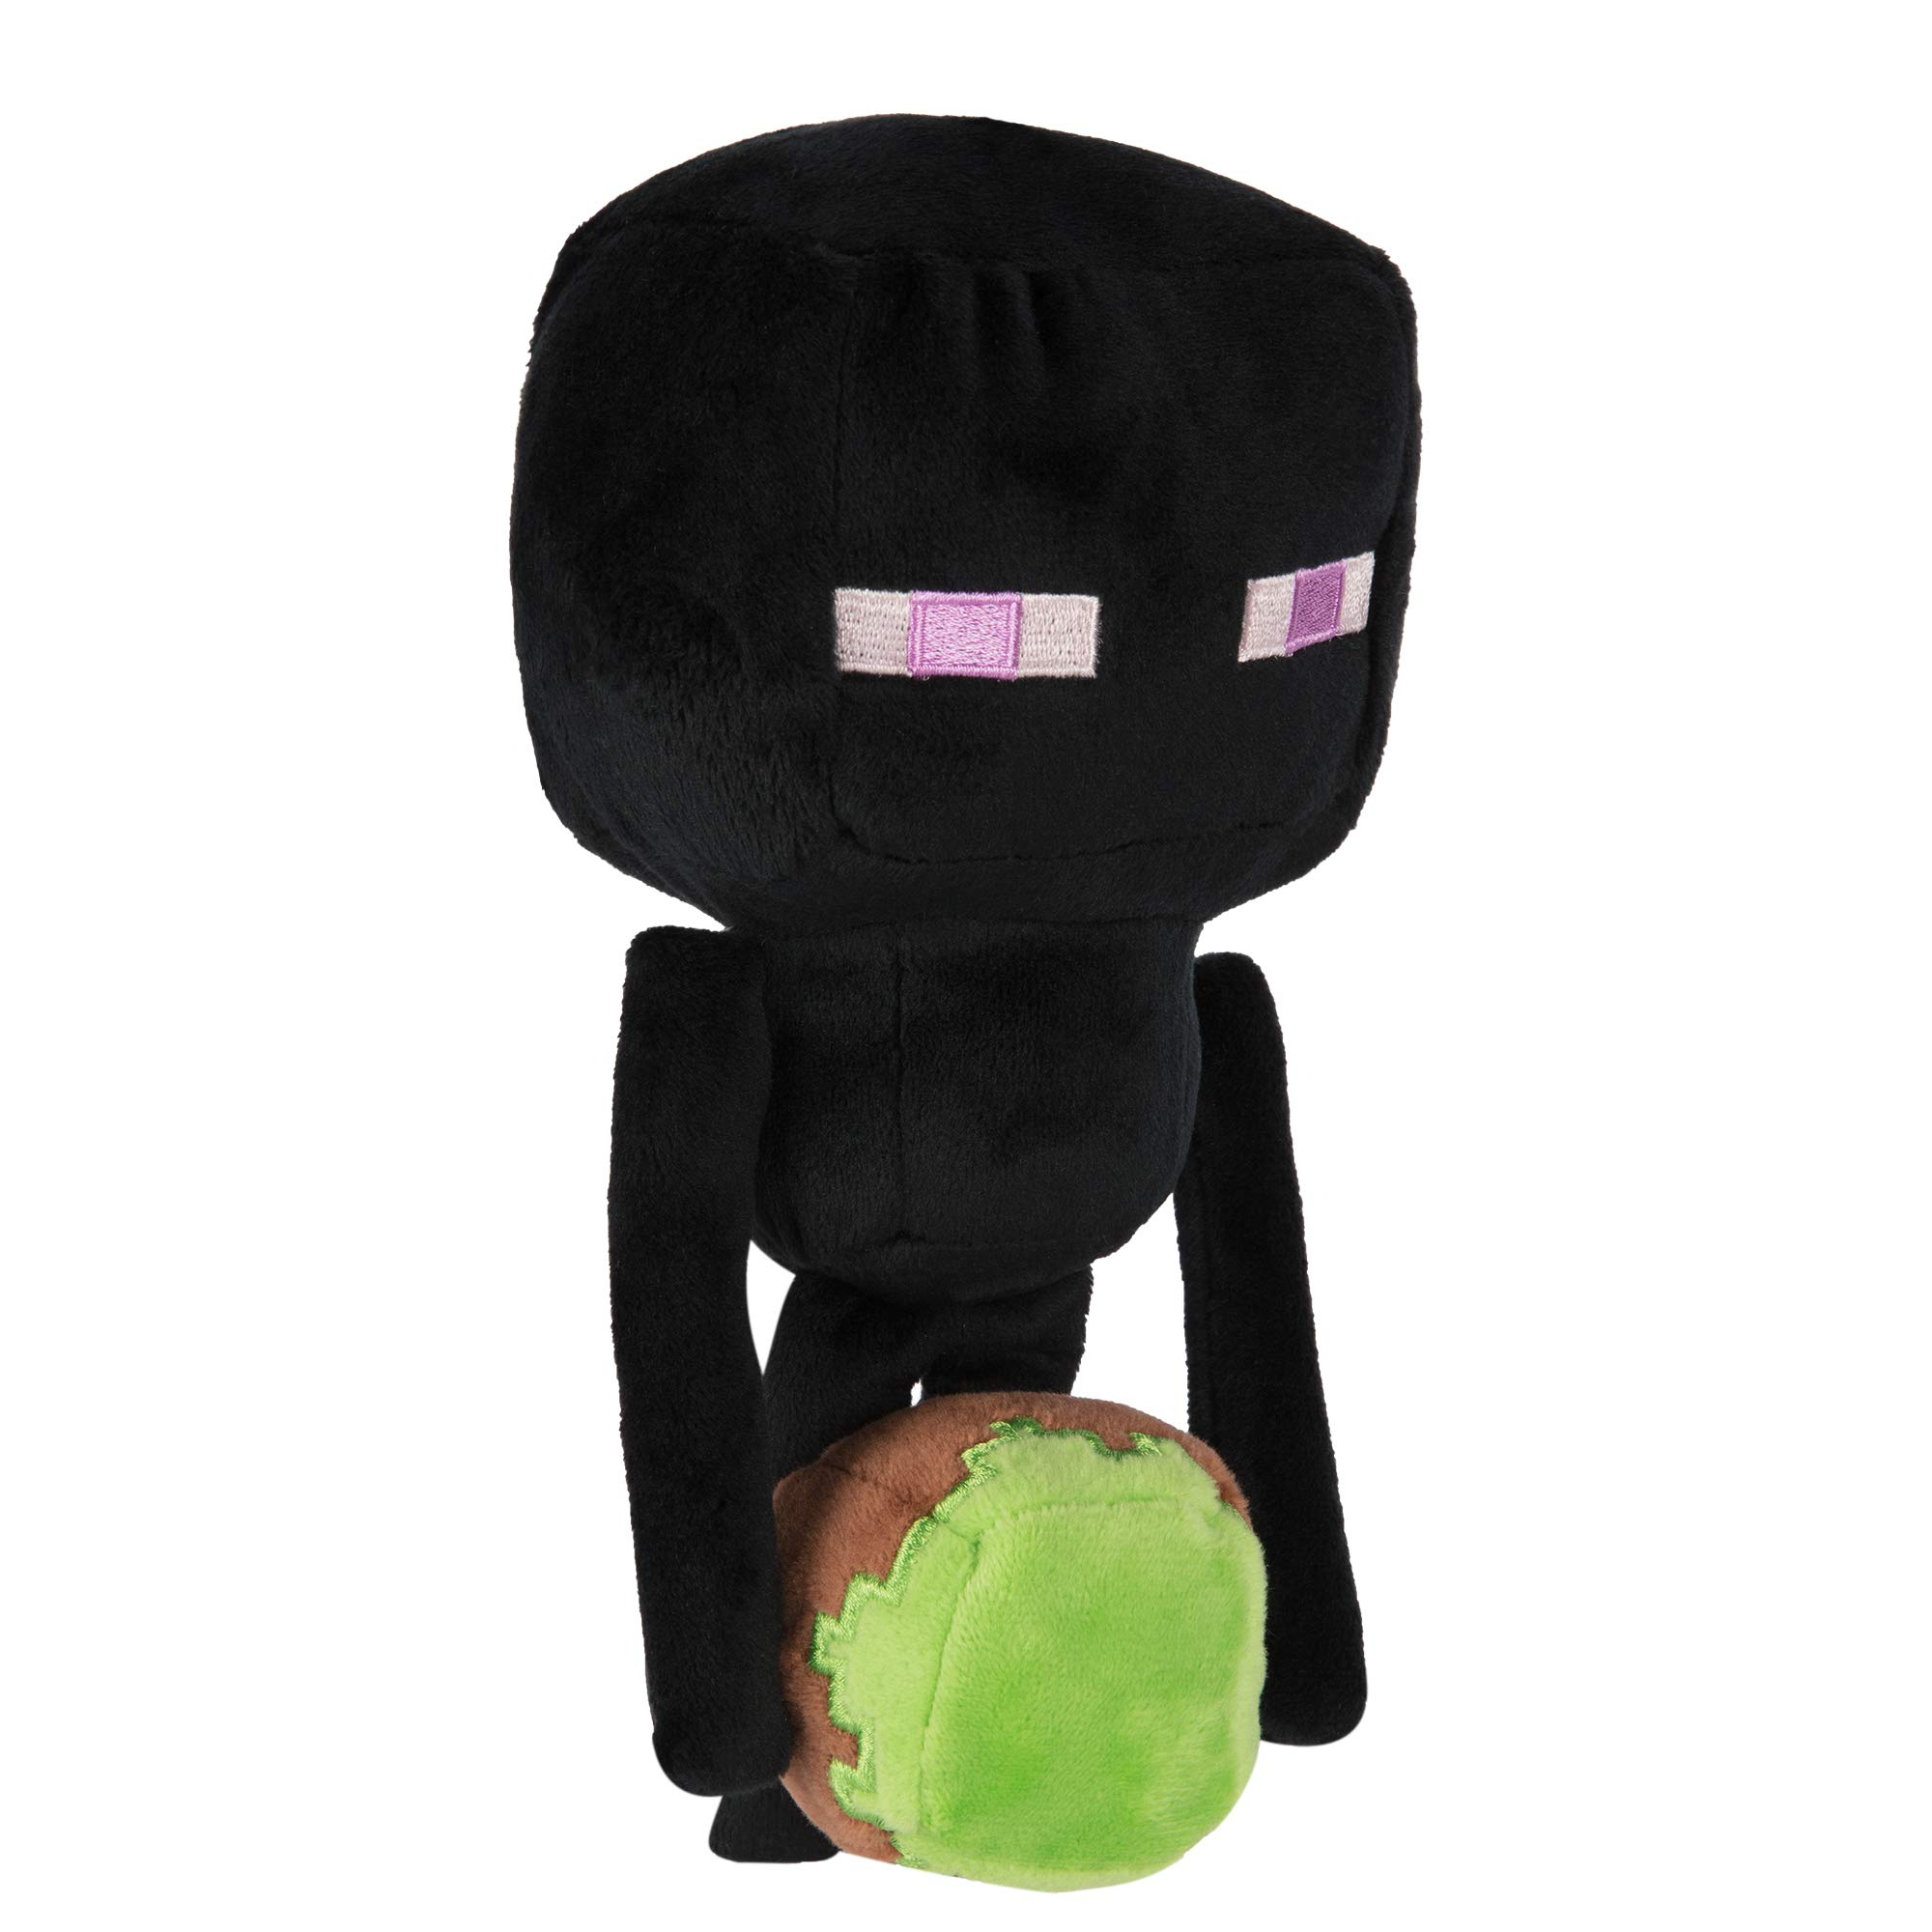 "JINX Minecraft Happy Explorer Enderman Plush Stuffed Toy, Black, 11"" Tall"